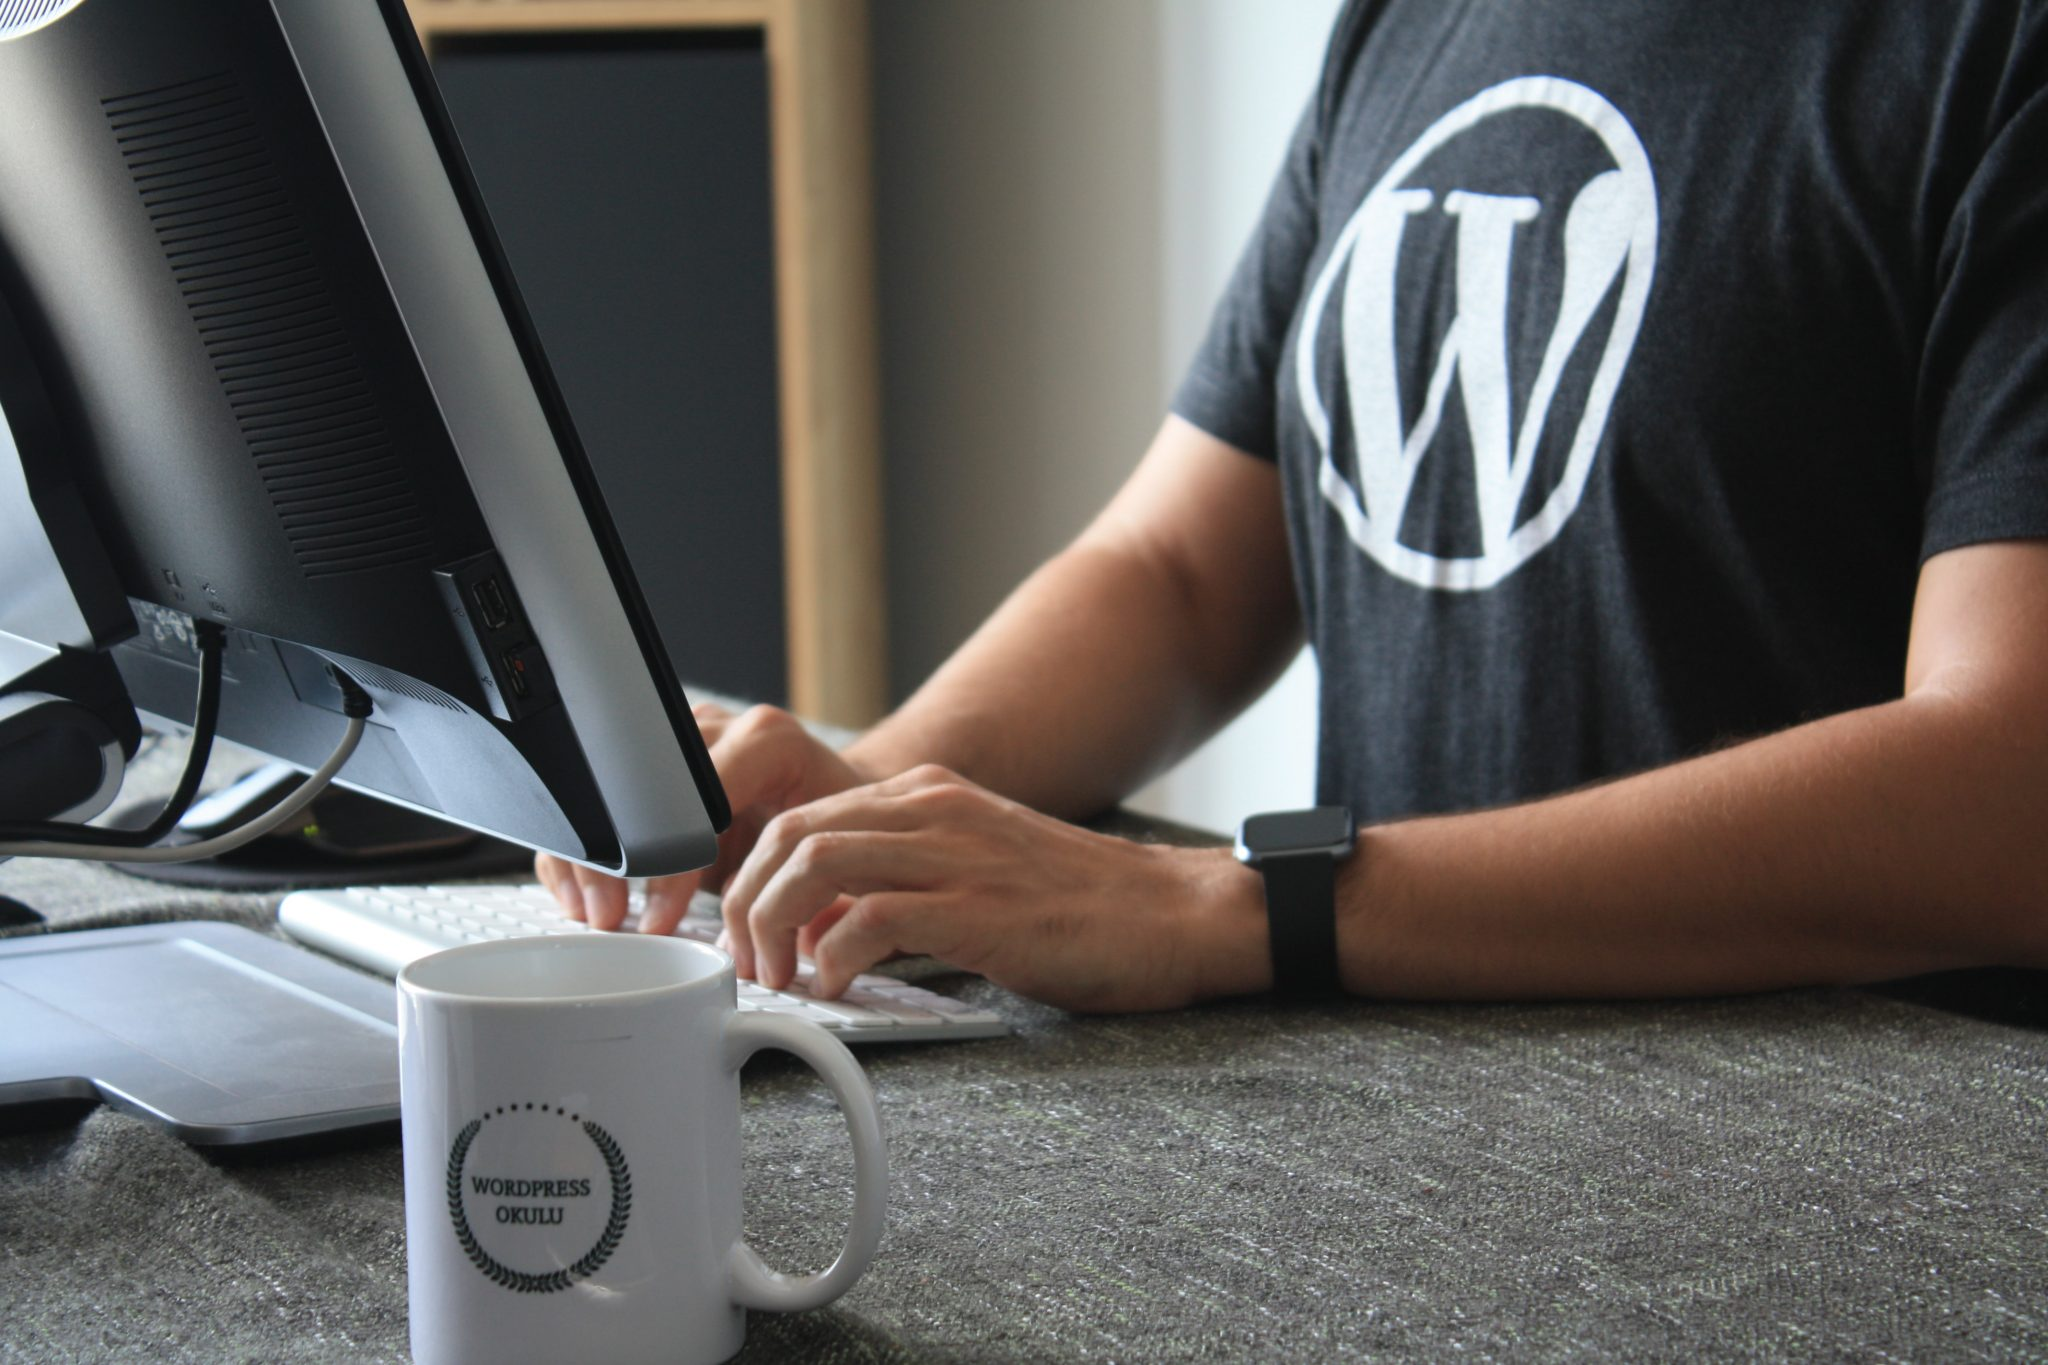 How to edit a WordPress website